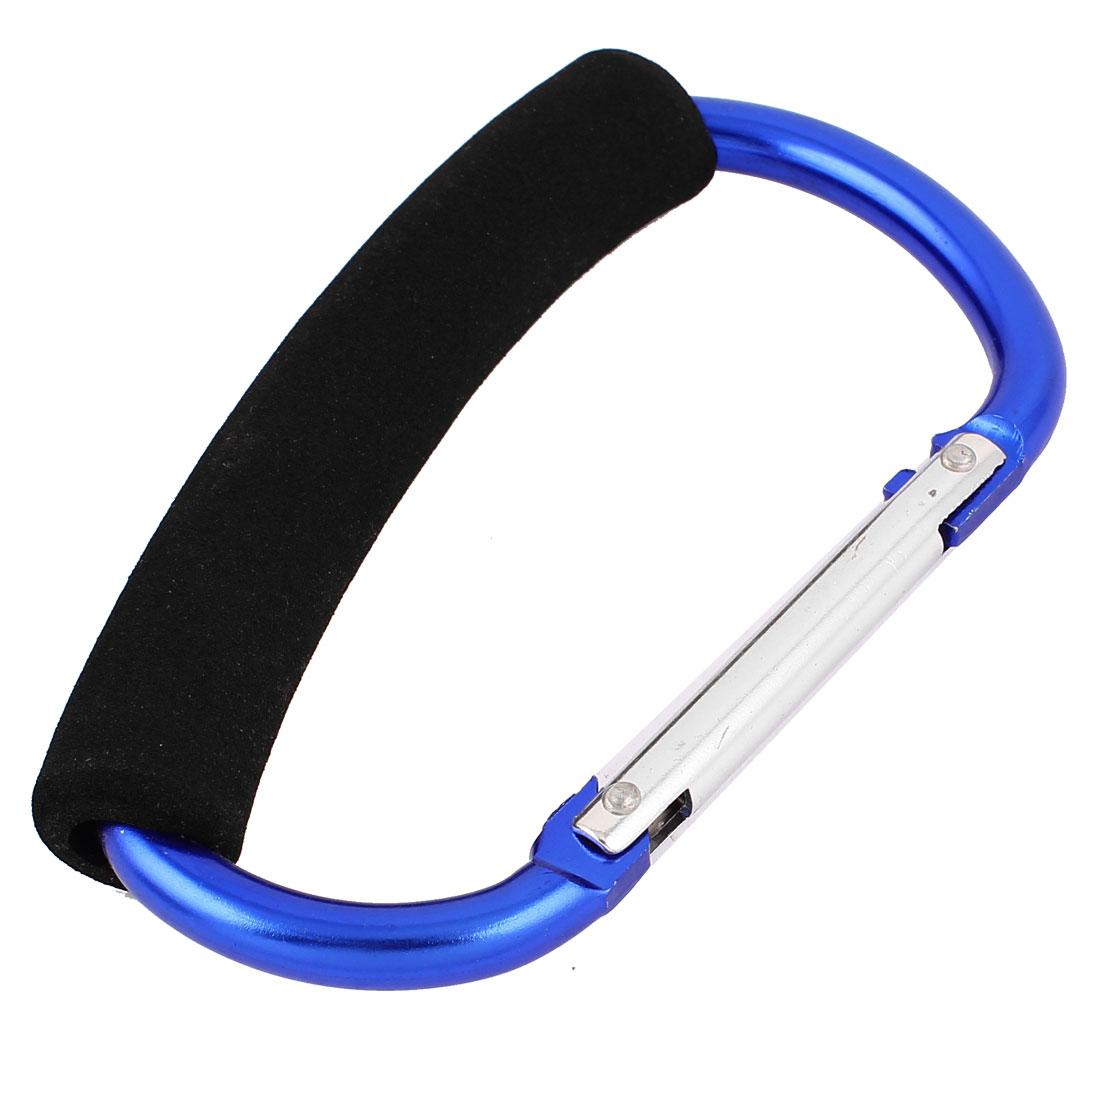 13cm Blue Metal Spring Loaded Snap Shopping Bag Hook Organizing Clip Carabiner Cords Holder w Handle Grip